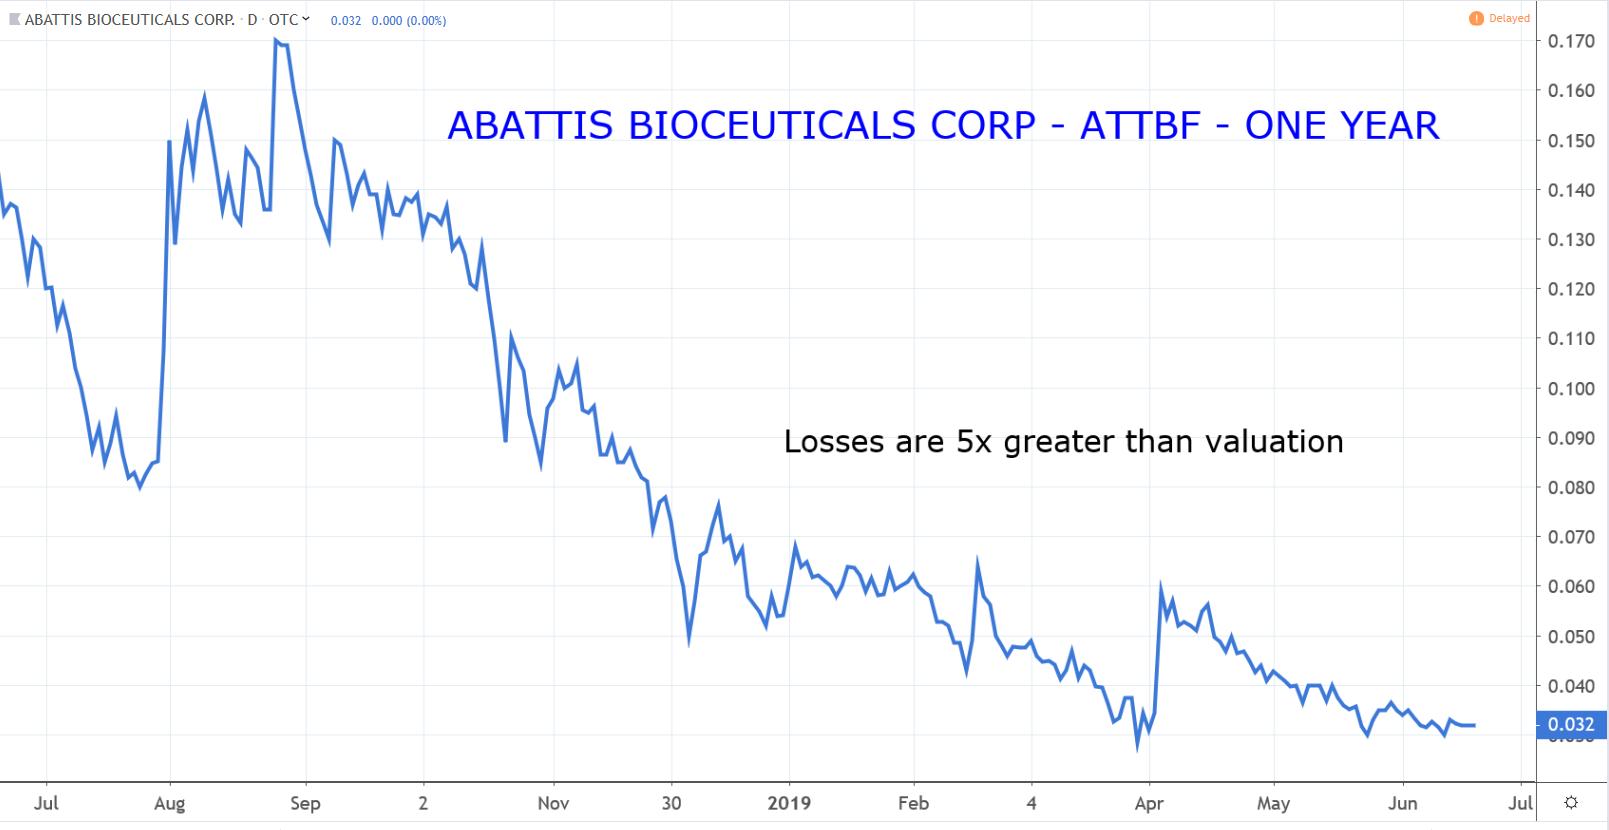 Penny Stocks: Abattis Bioceuticals (ATTBF)